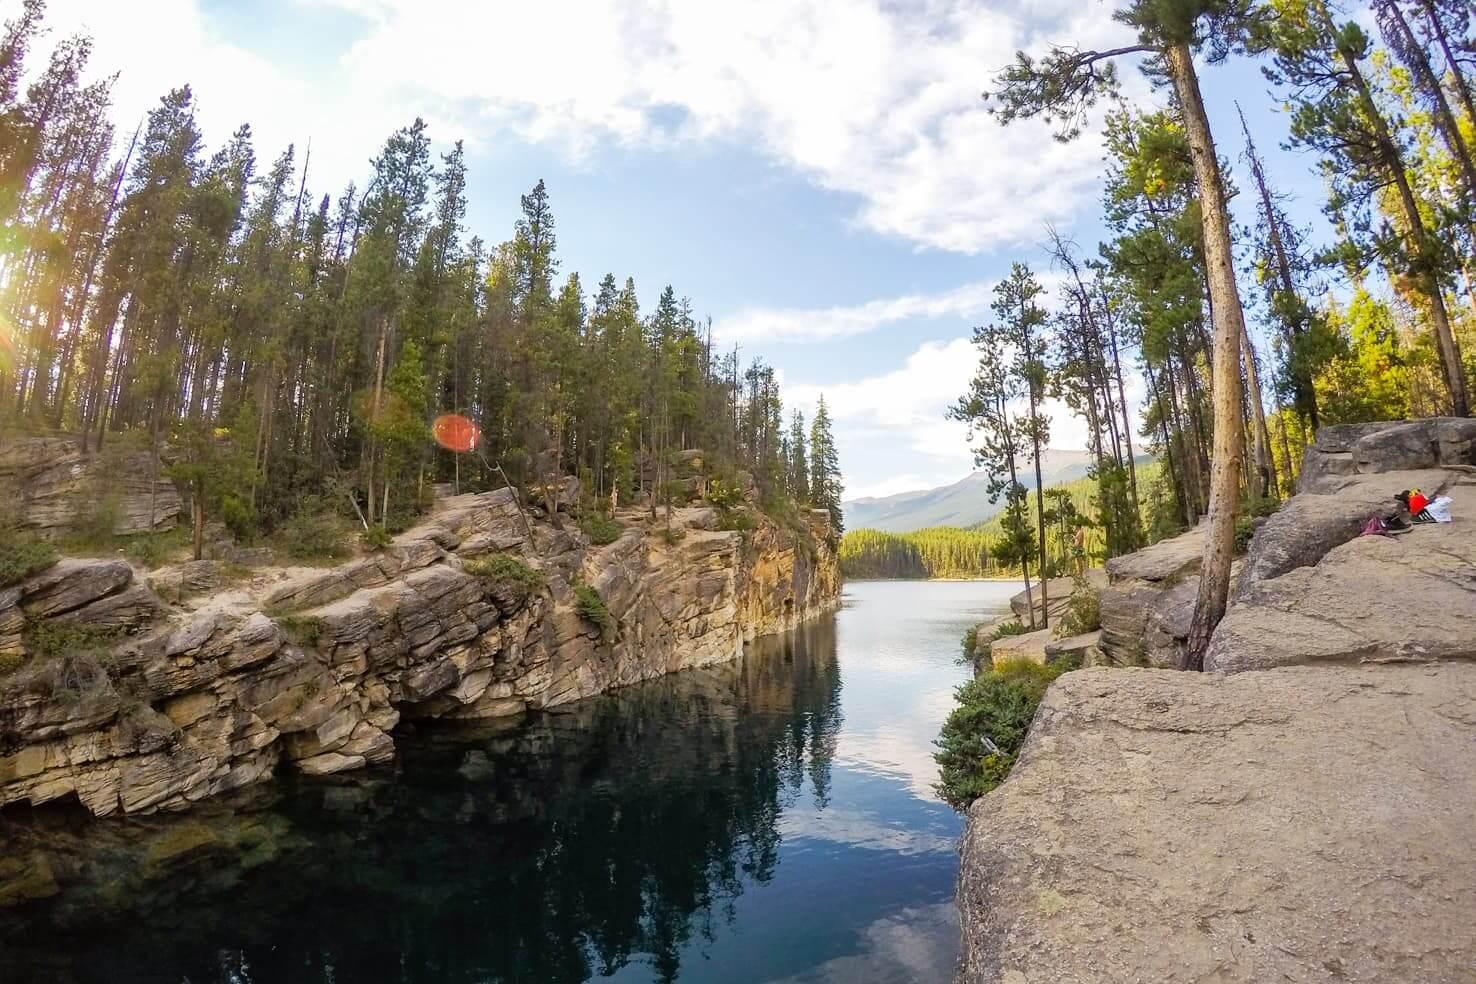 Hiking in Jasper National Park - Horseshoe Lake